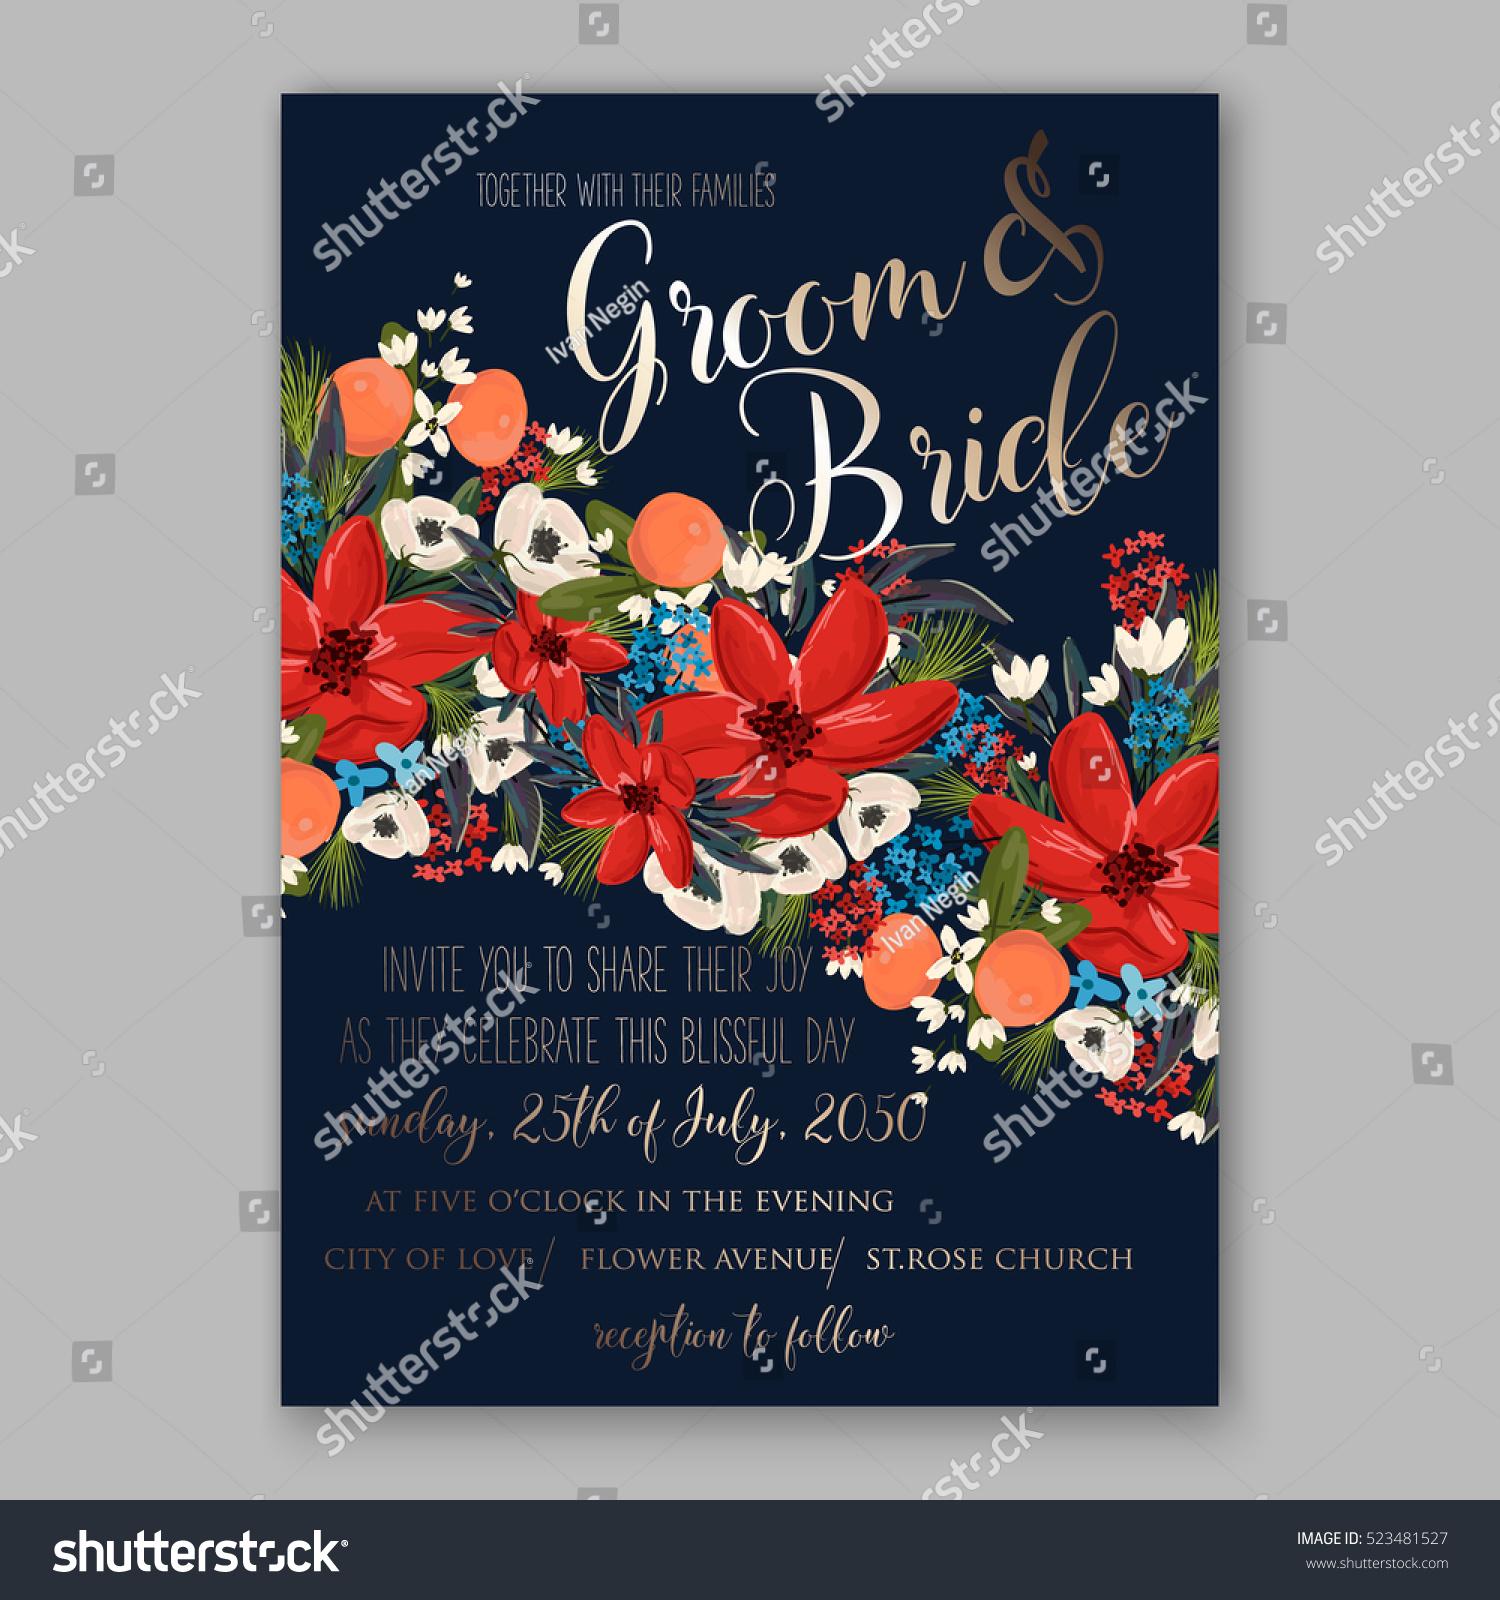 Poinsettia Winter Wedding Invitation Template Card Stock Vector ...